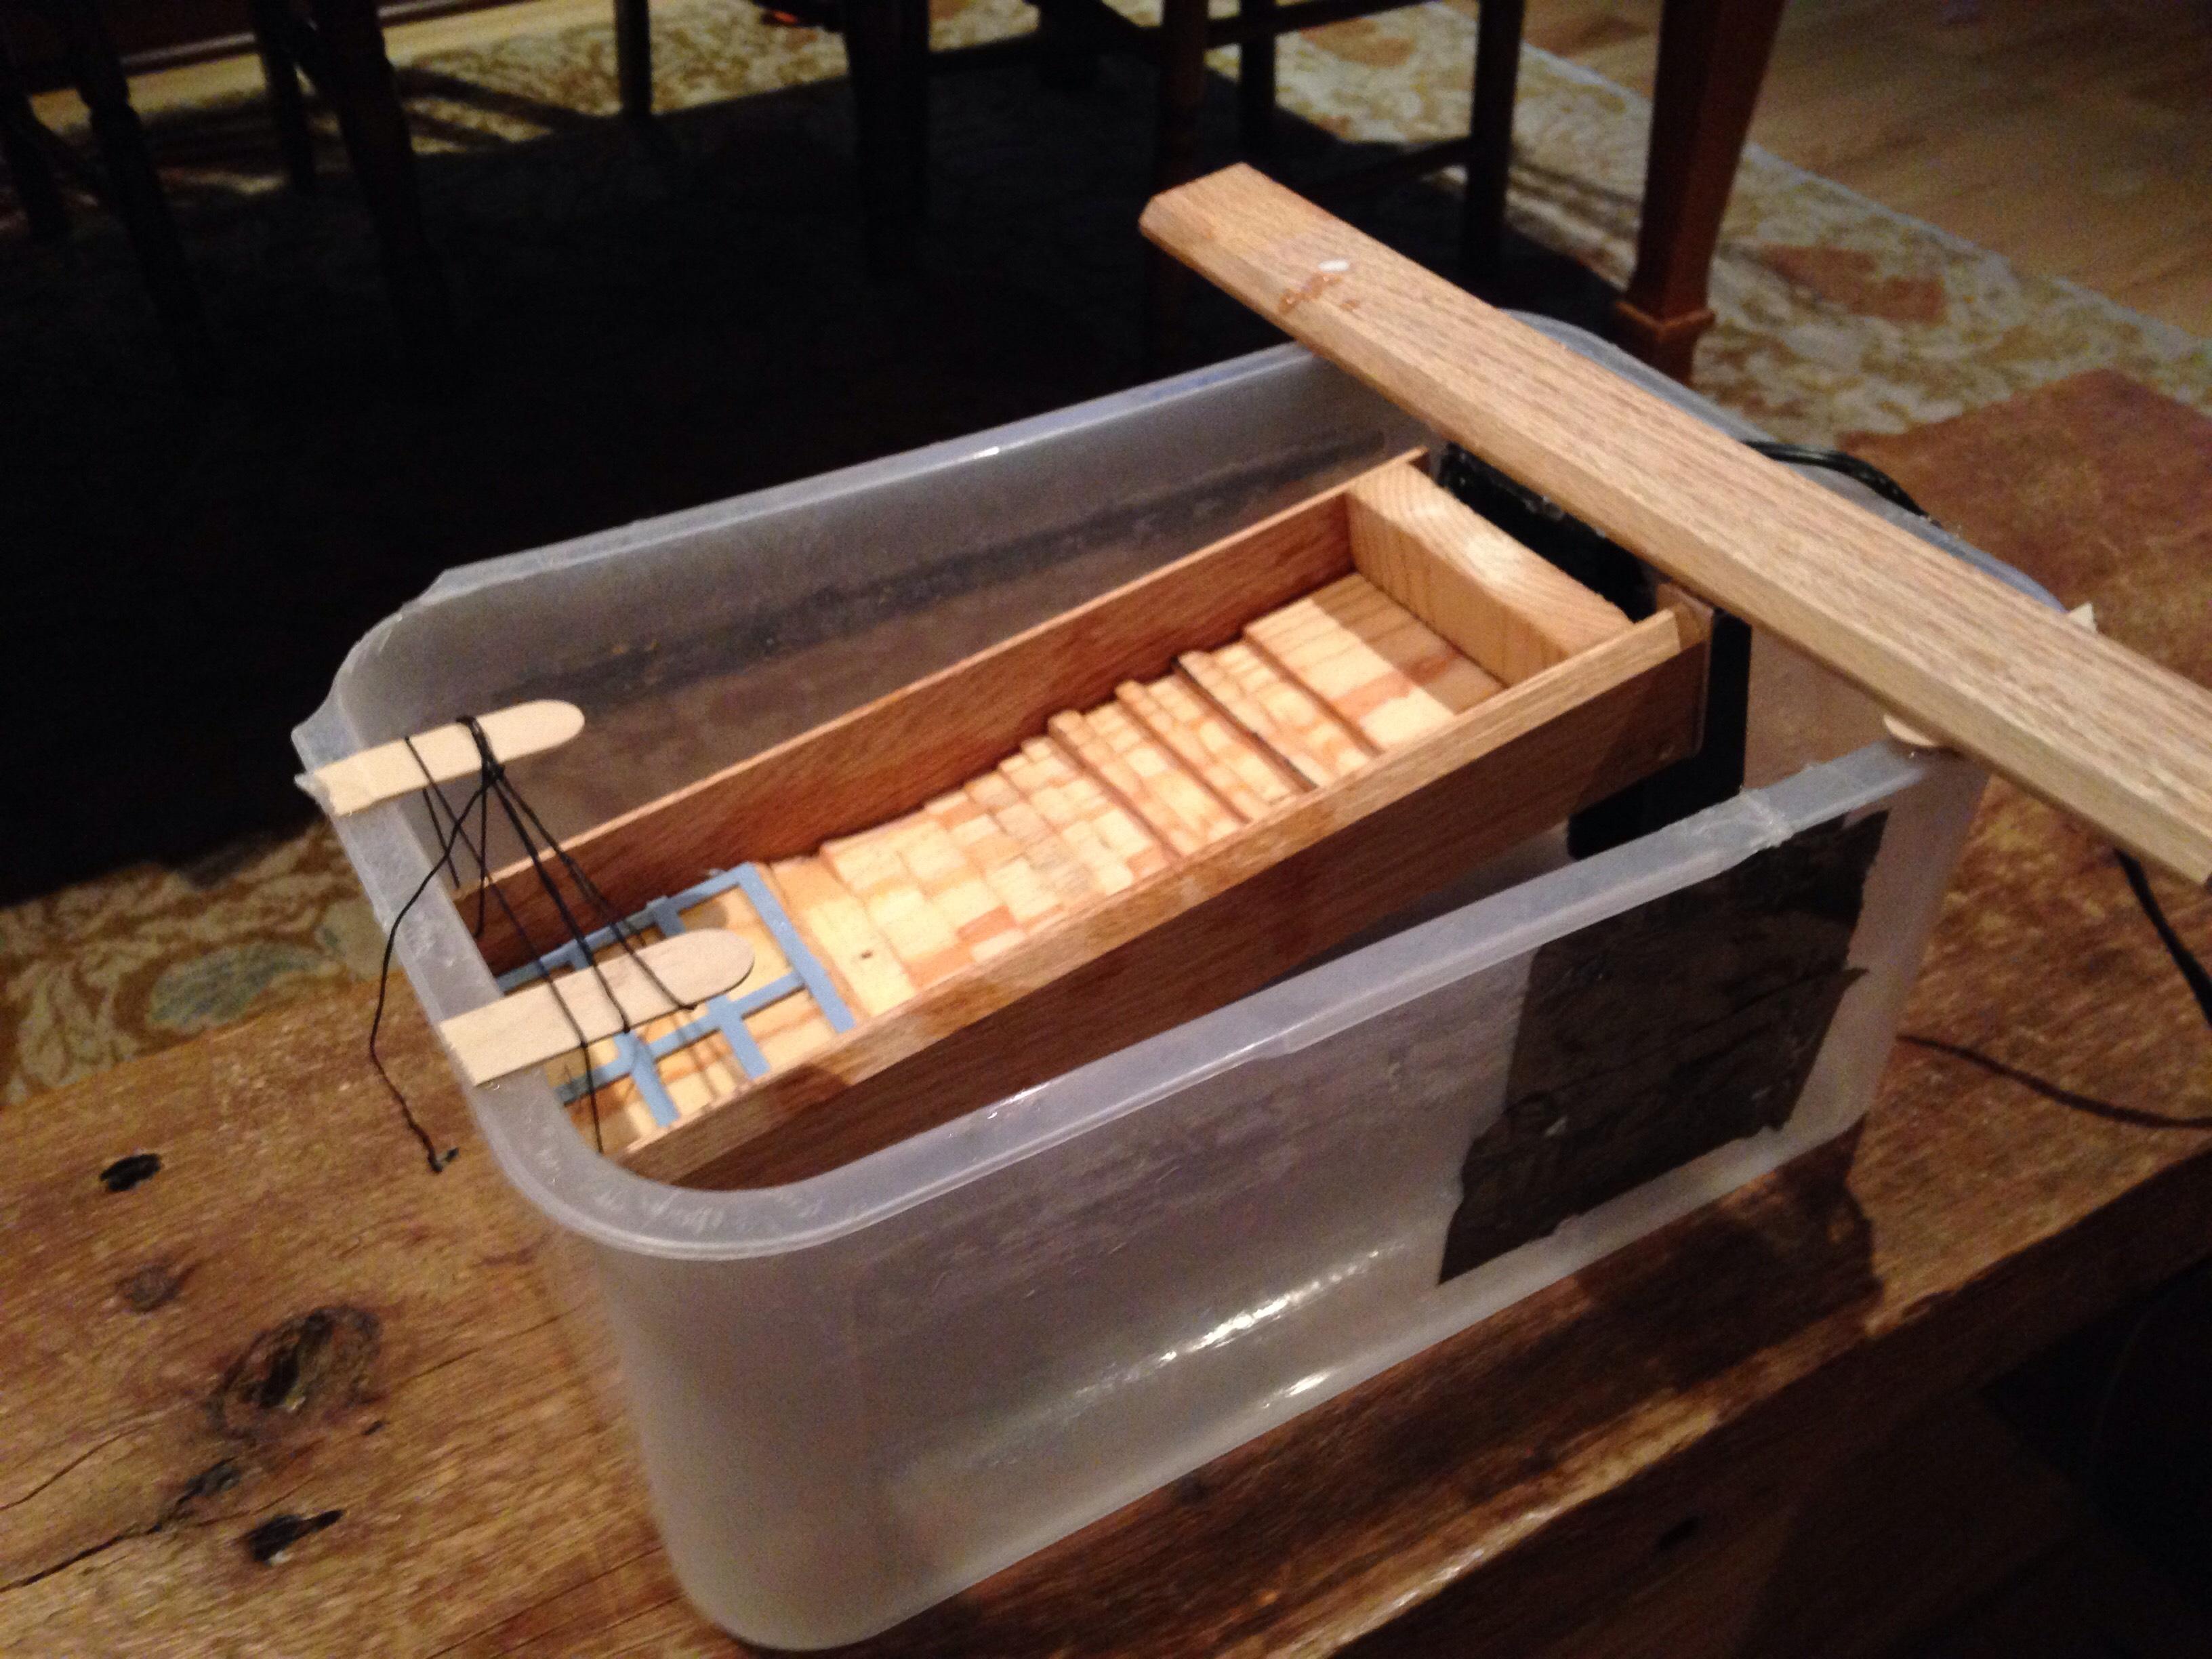 Picture of Homemade Recirculating Sluice Box